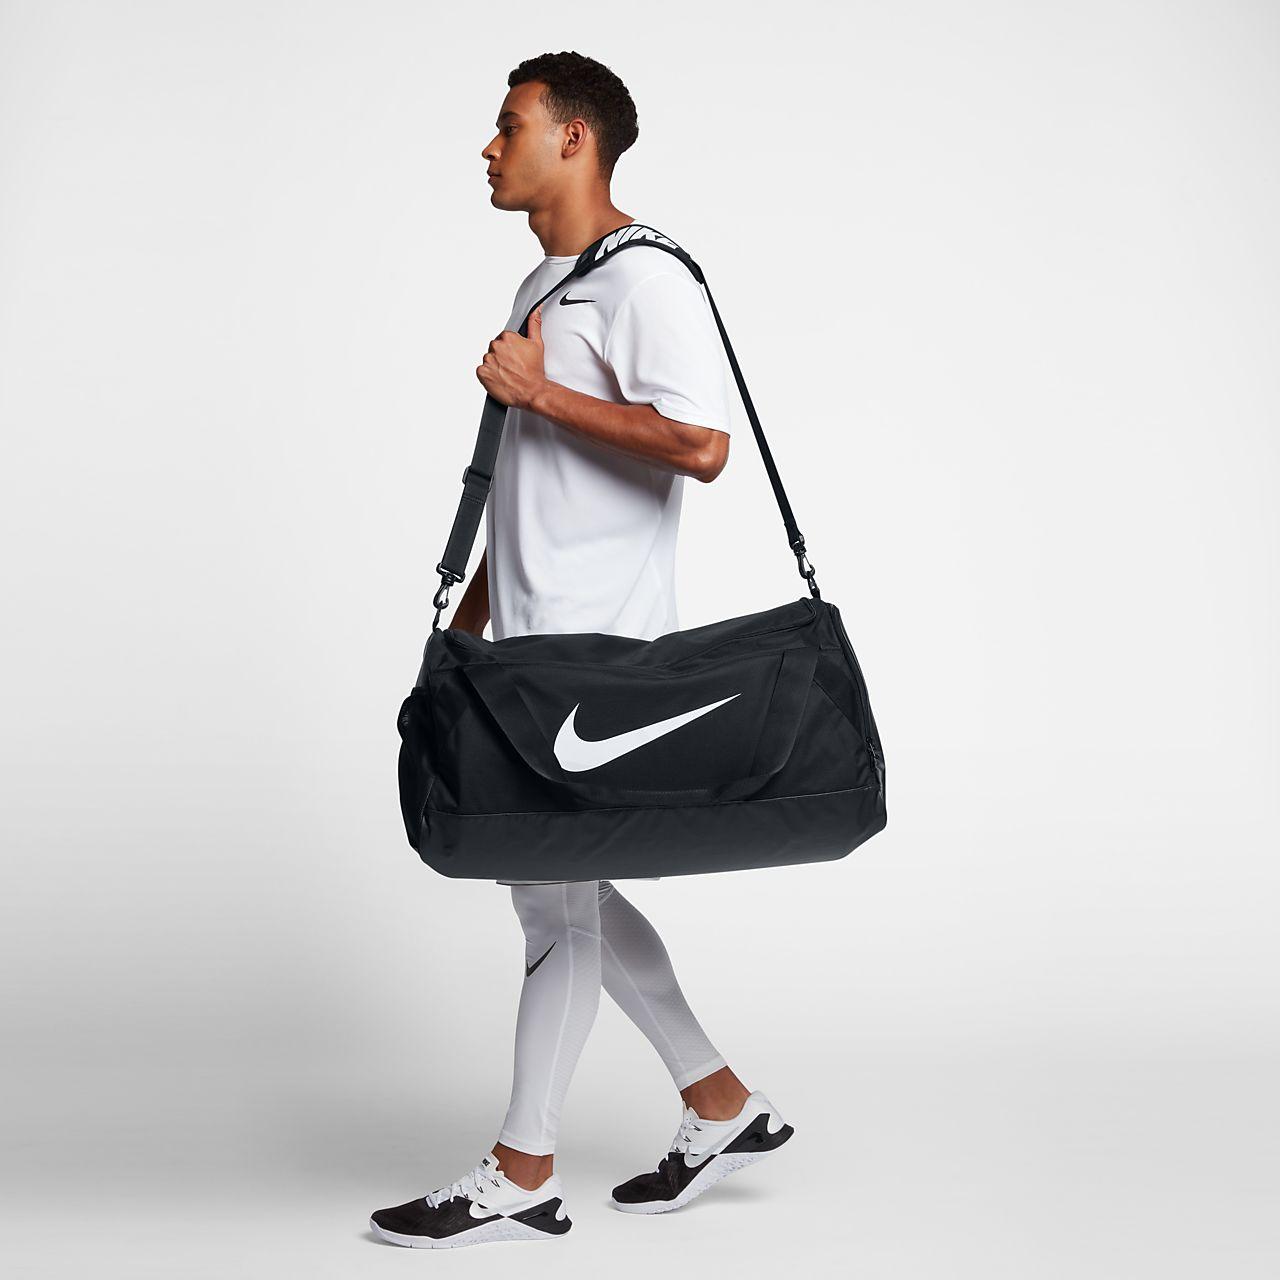 Pr Brasilia grande Bolso De Lona Nike Entrenamiento PwYzWxqv8Z